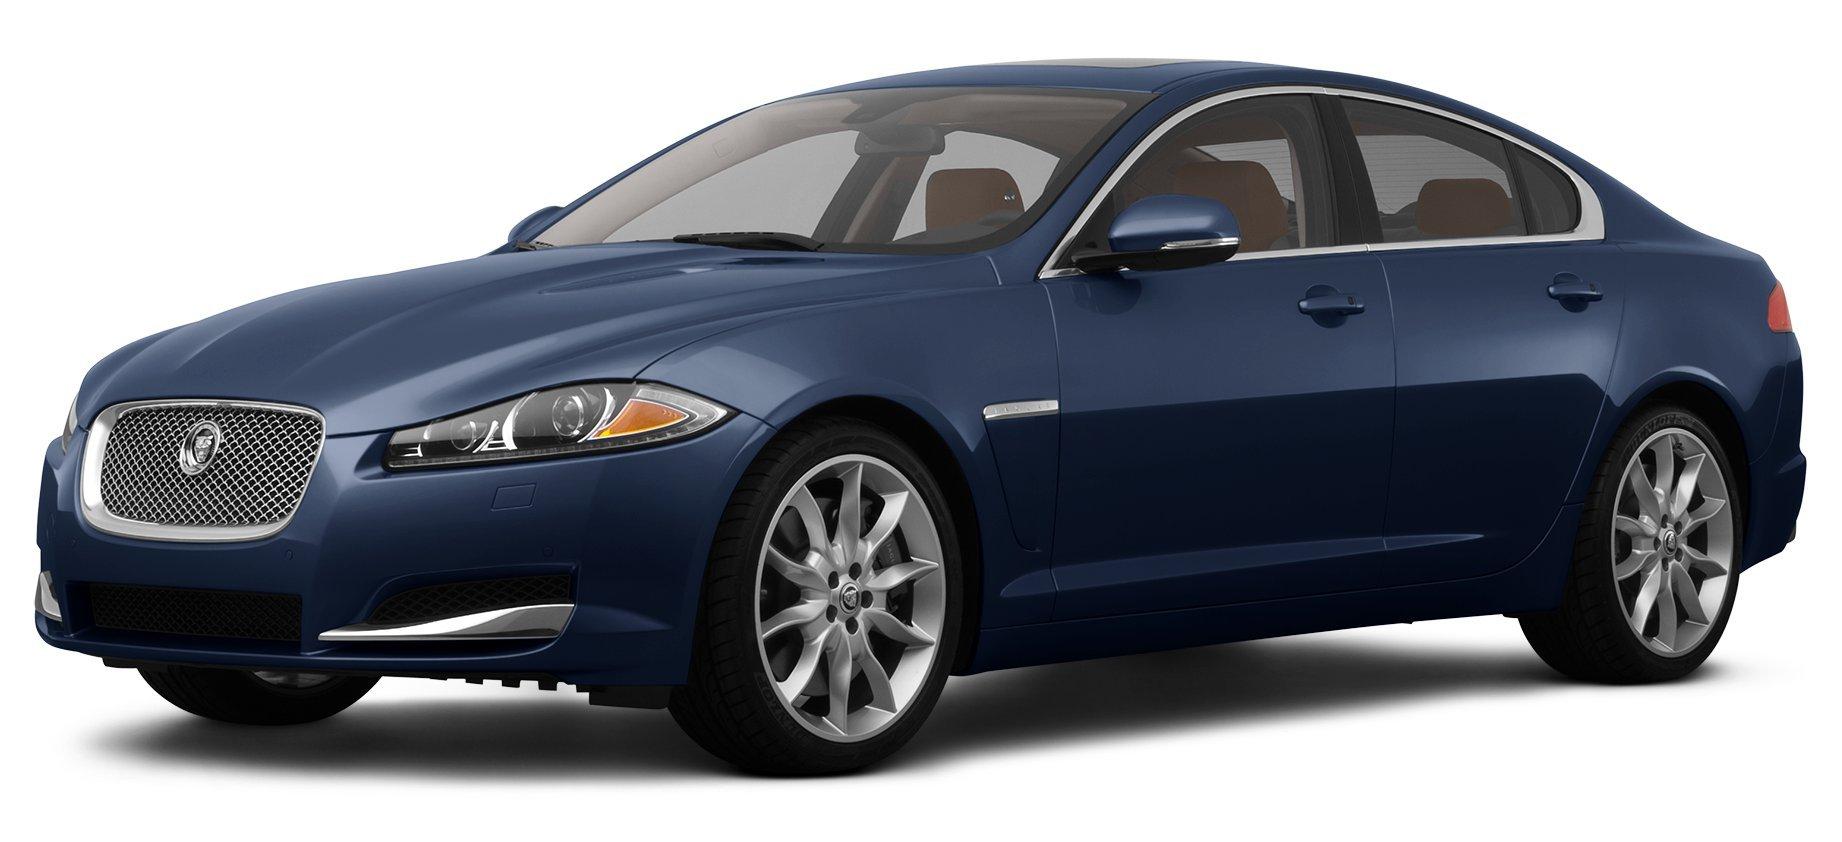 Car Equus (Hyundai): manufacturer, specifications, configuration, reviews 59